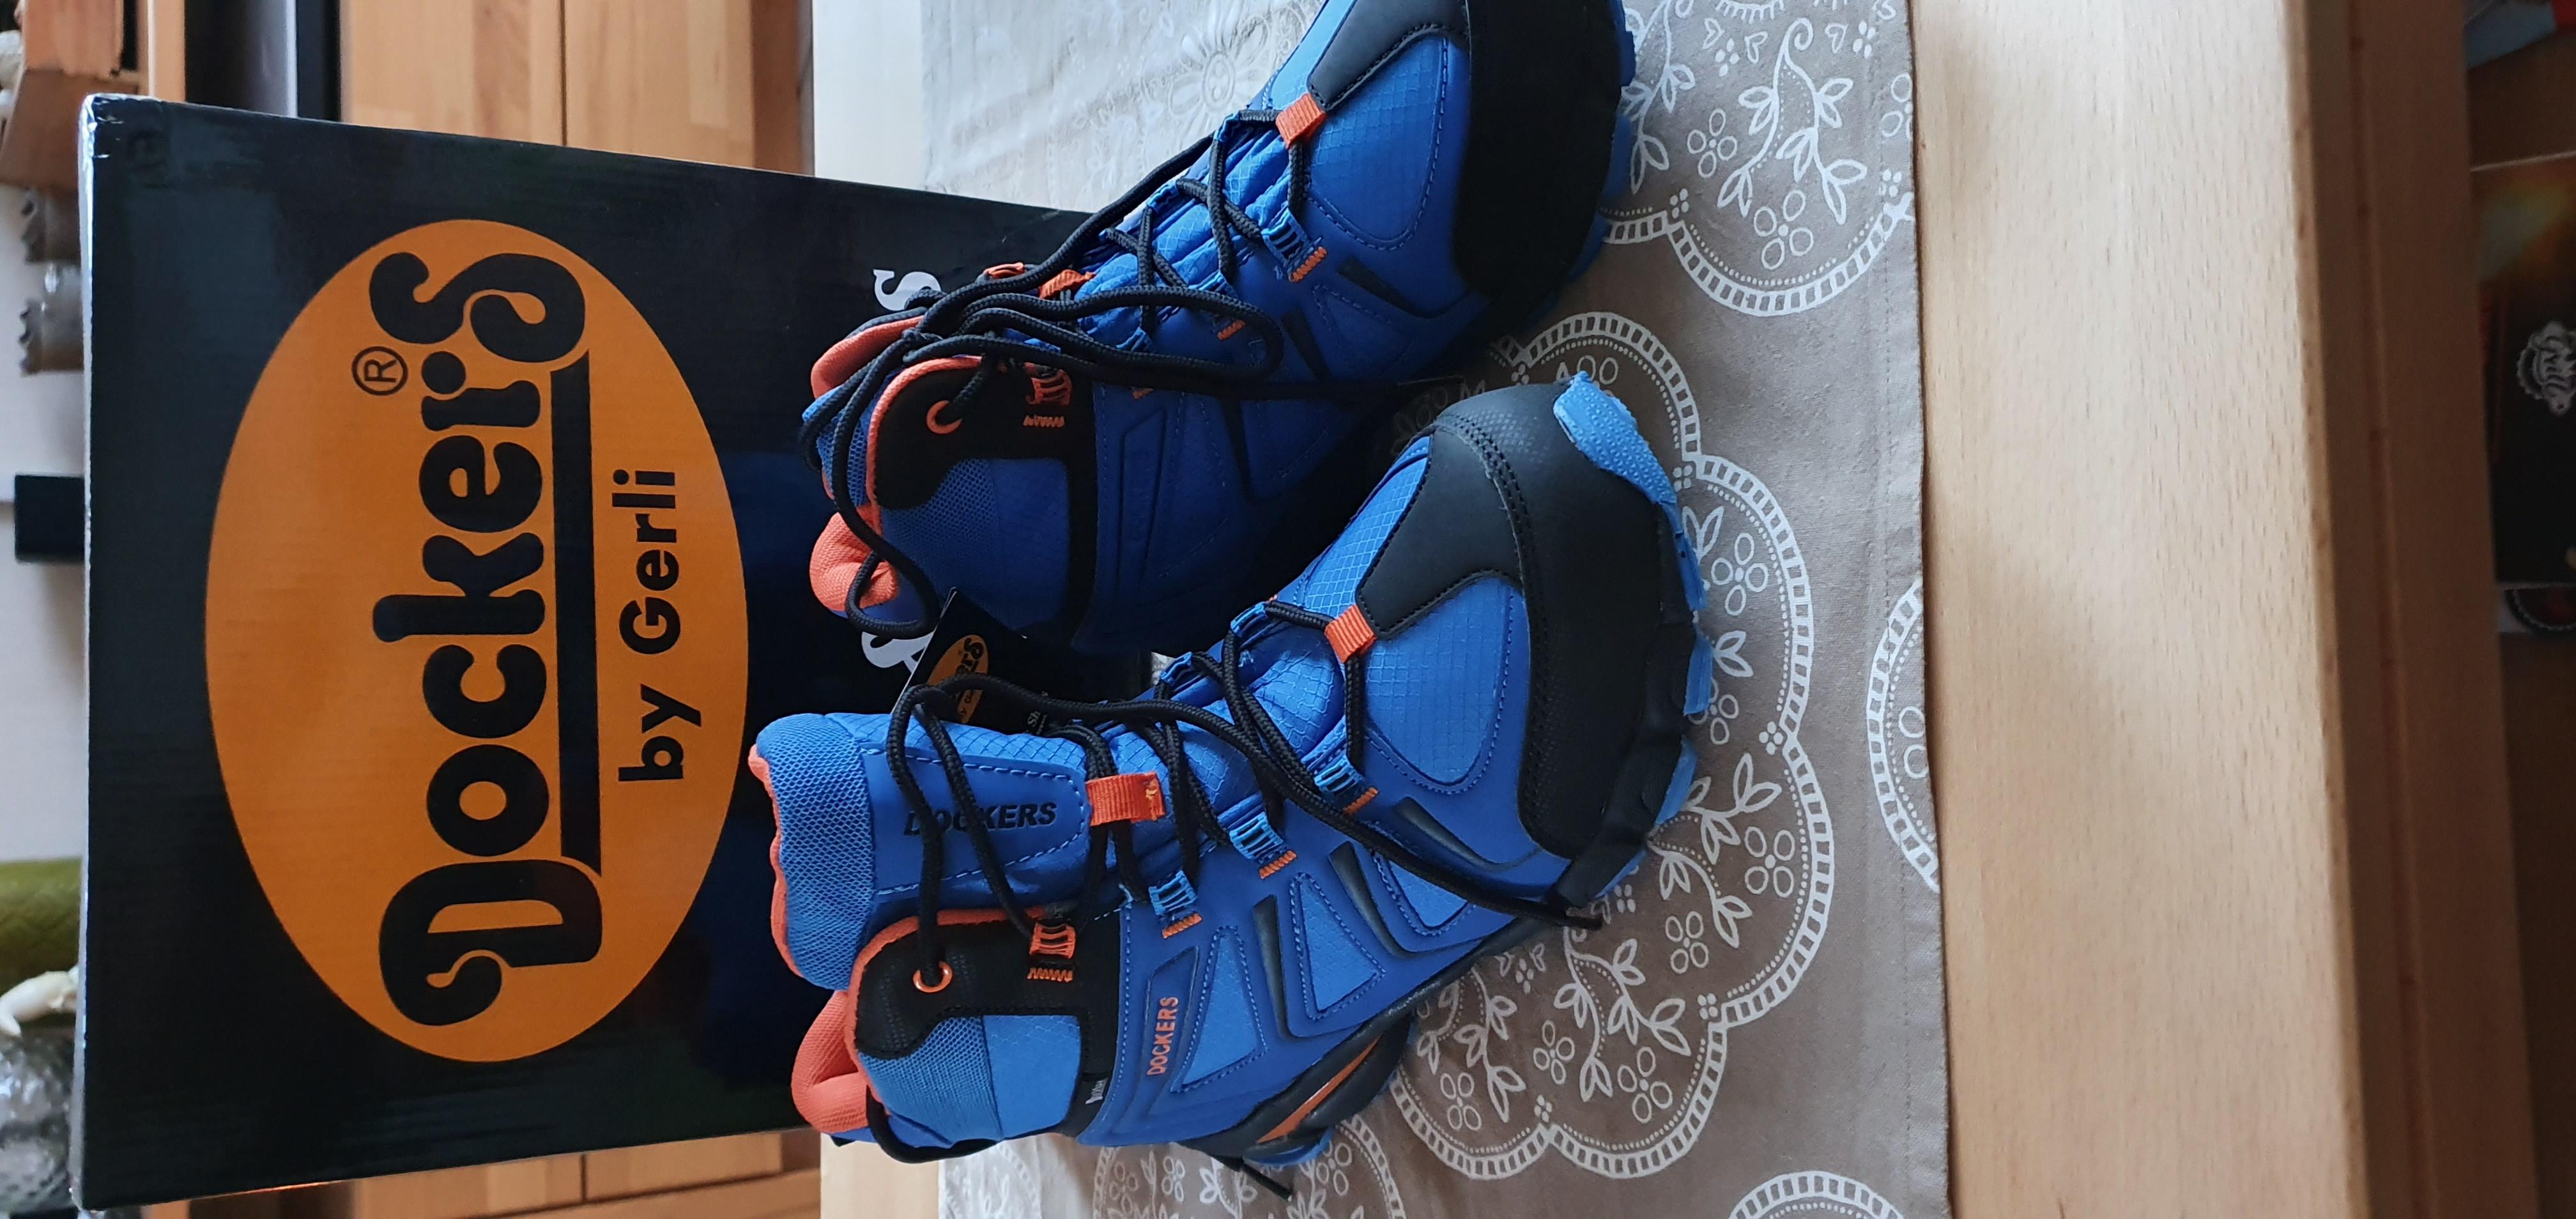 Docker's Schuhe